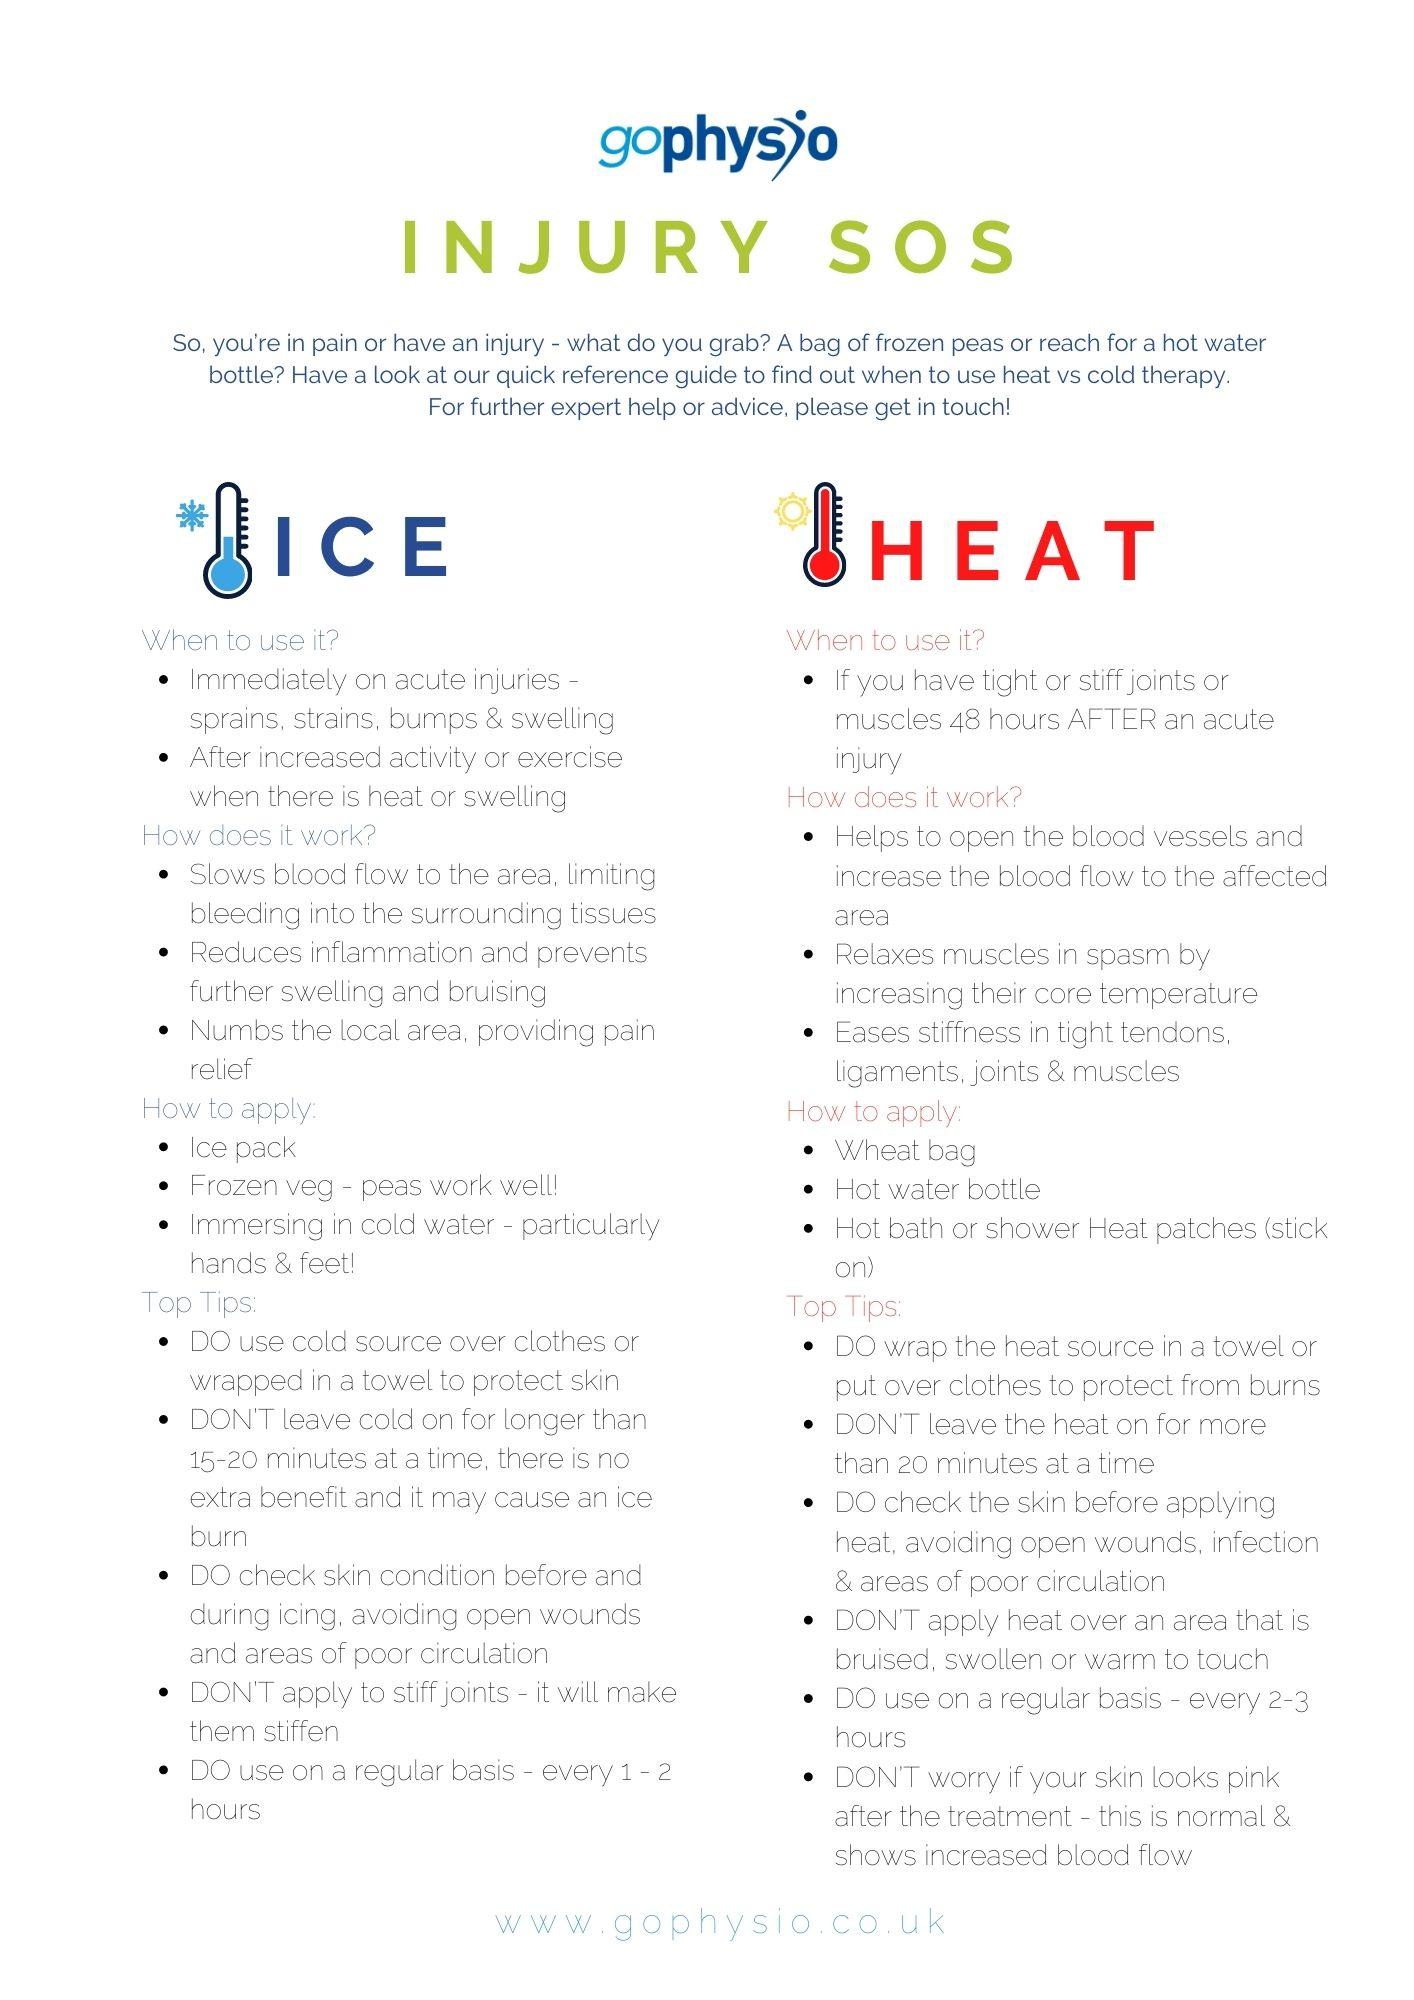 Ice or heat? goPhysio